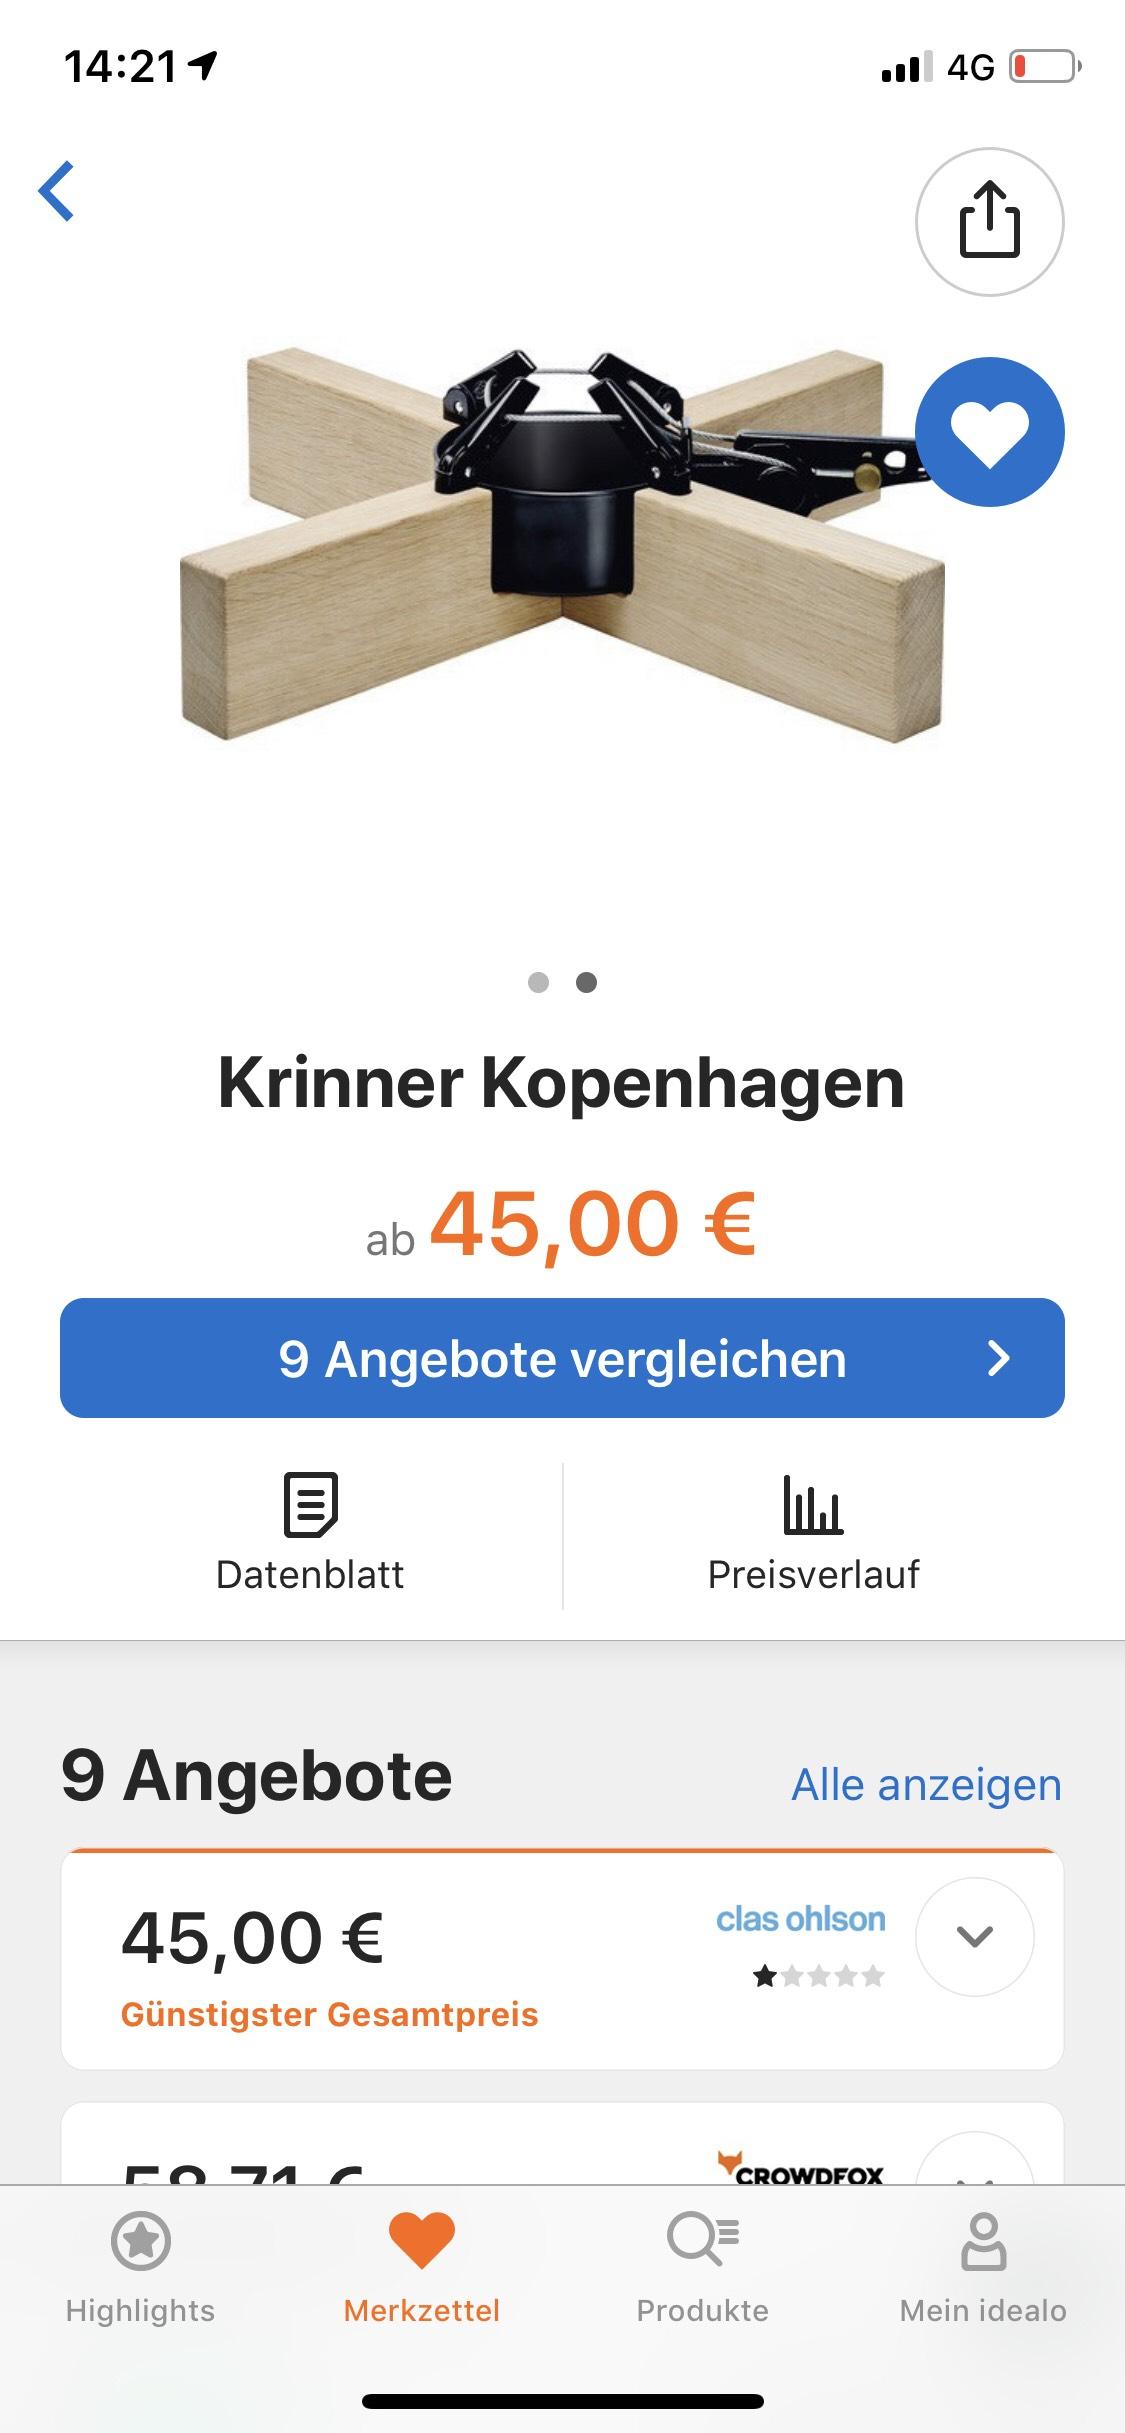 [clasohlson.de] Krinner Kopenhagen 2,5 m / 12 cm Christbaumständer - 50,95 €